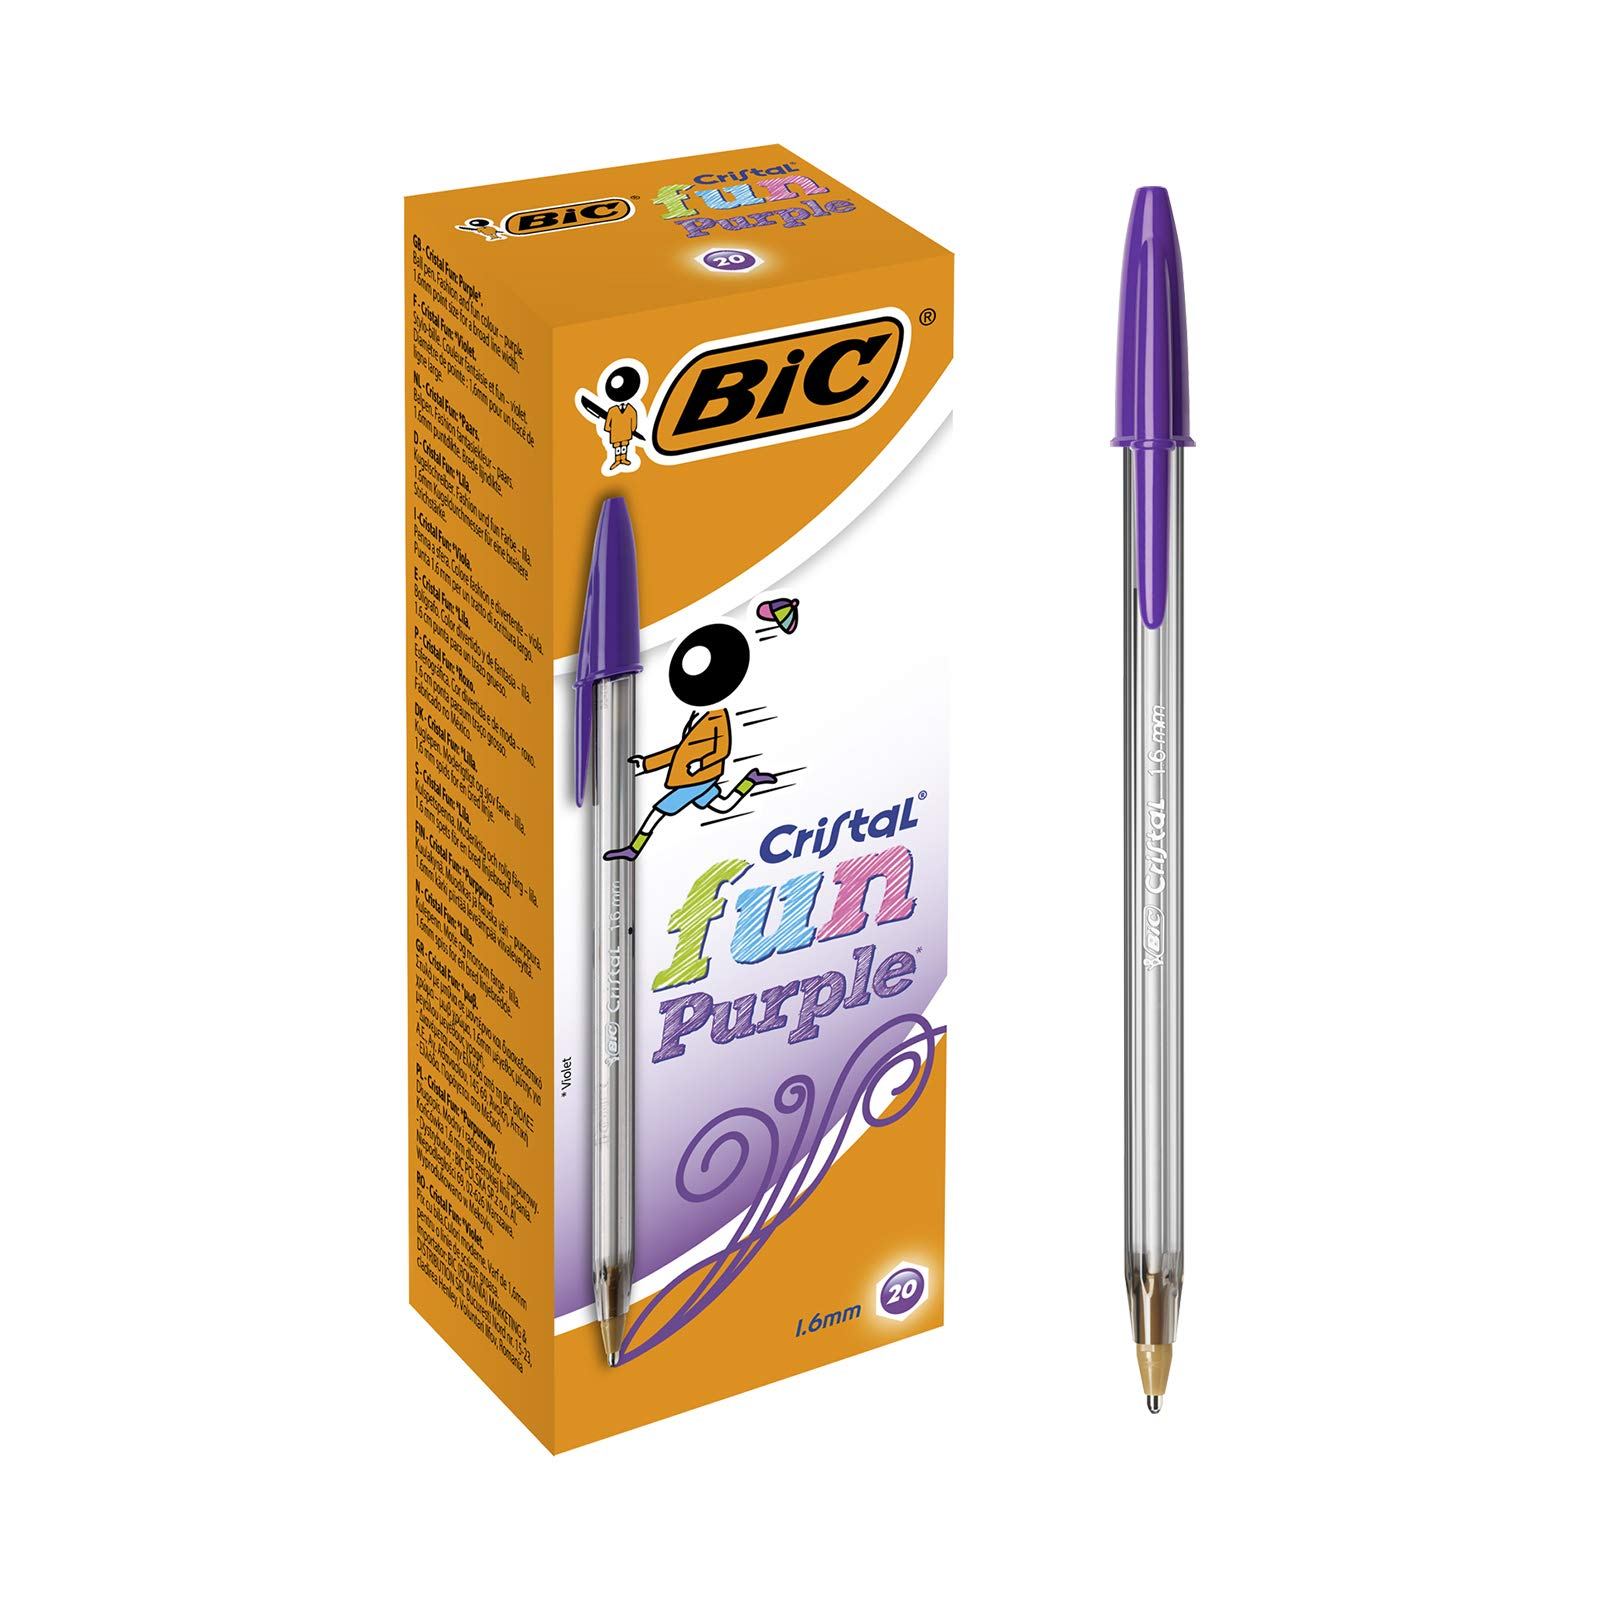 BIC Cristal Fun Ballpoint Pens Wide Point (1.6 mm) - Purple, Box of 20